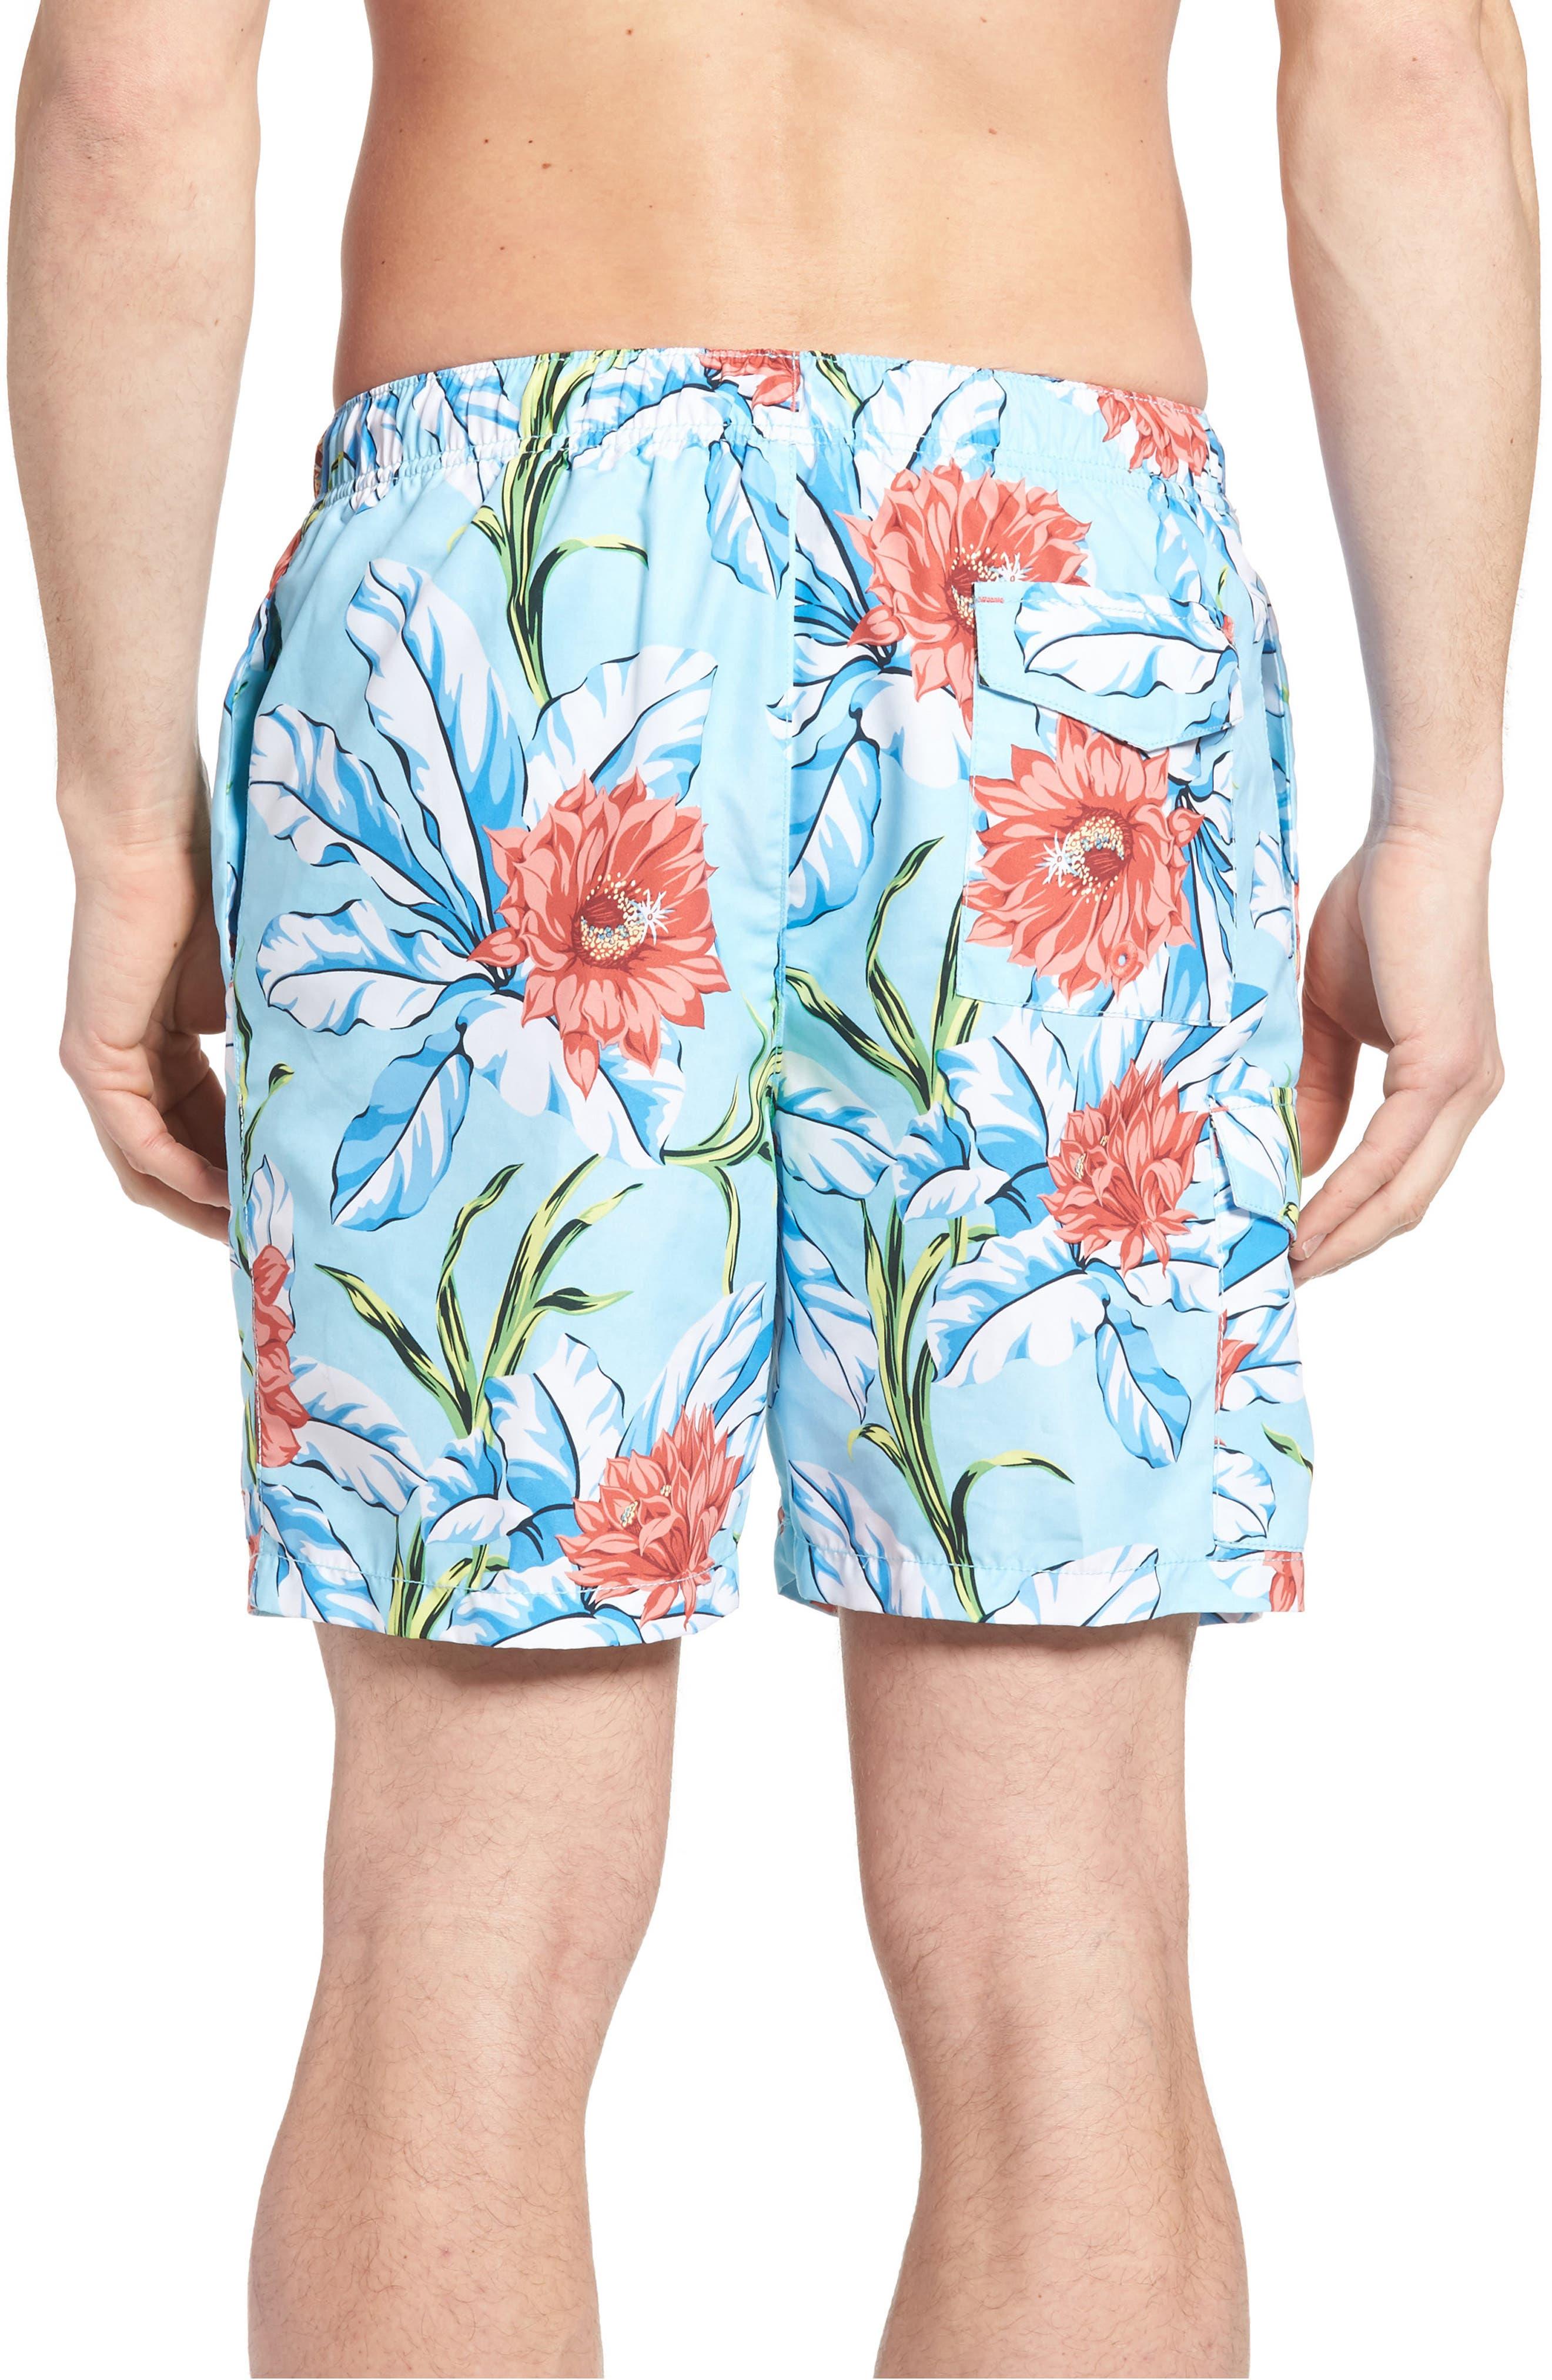 Naples Fira Floral Swim Trunks,                             Alternate thumbnail 2, color,                             Shasta